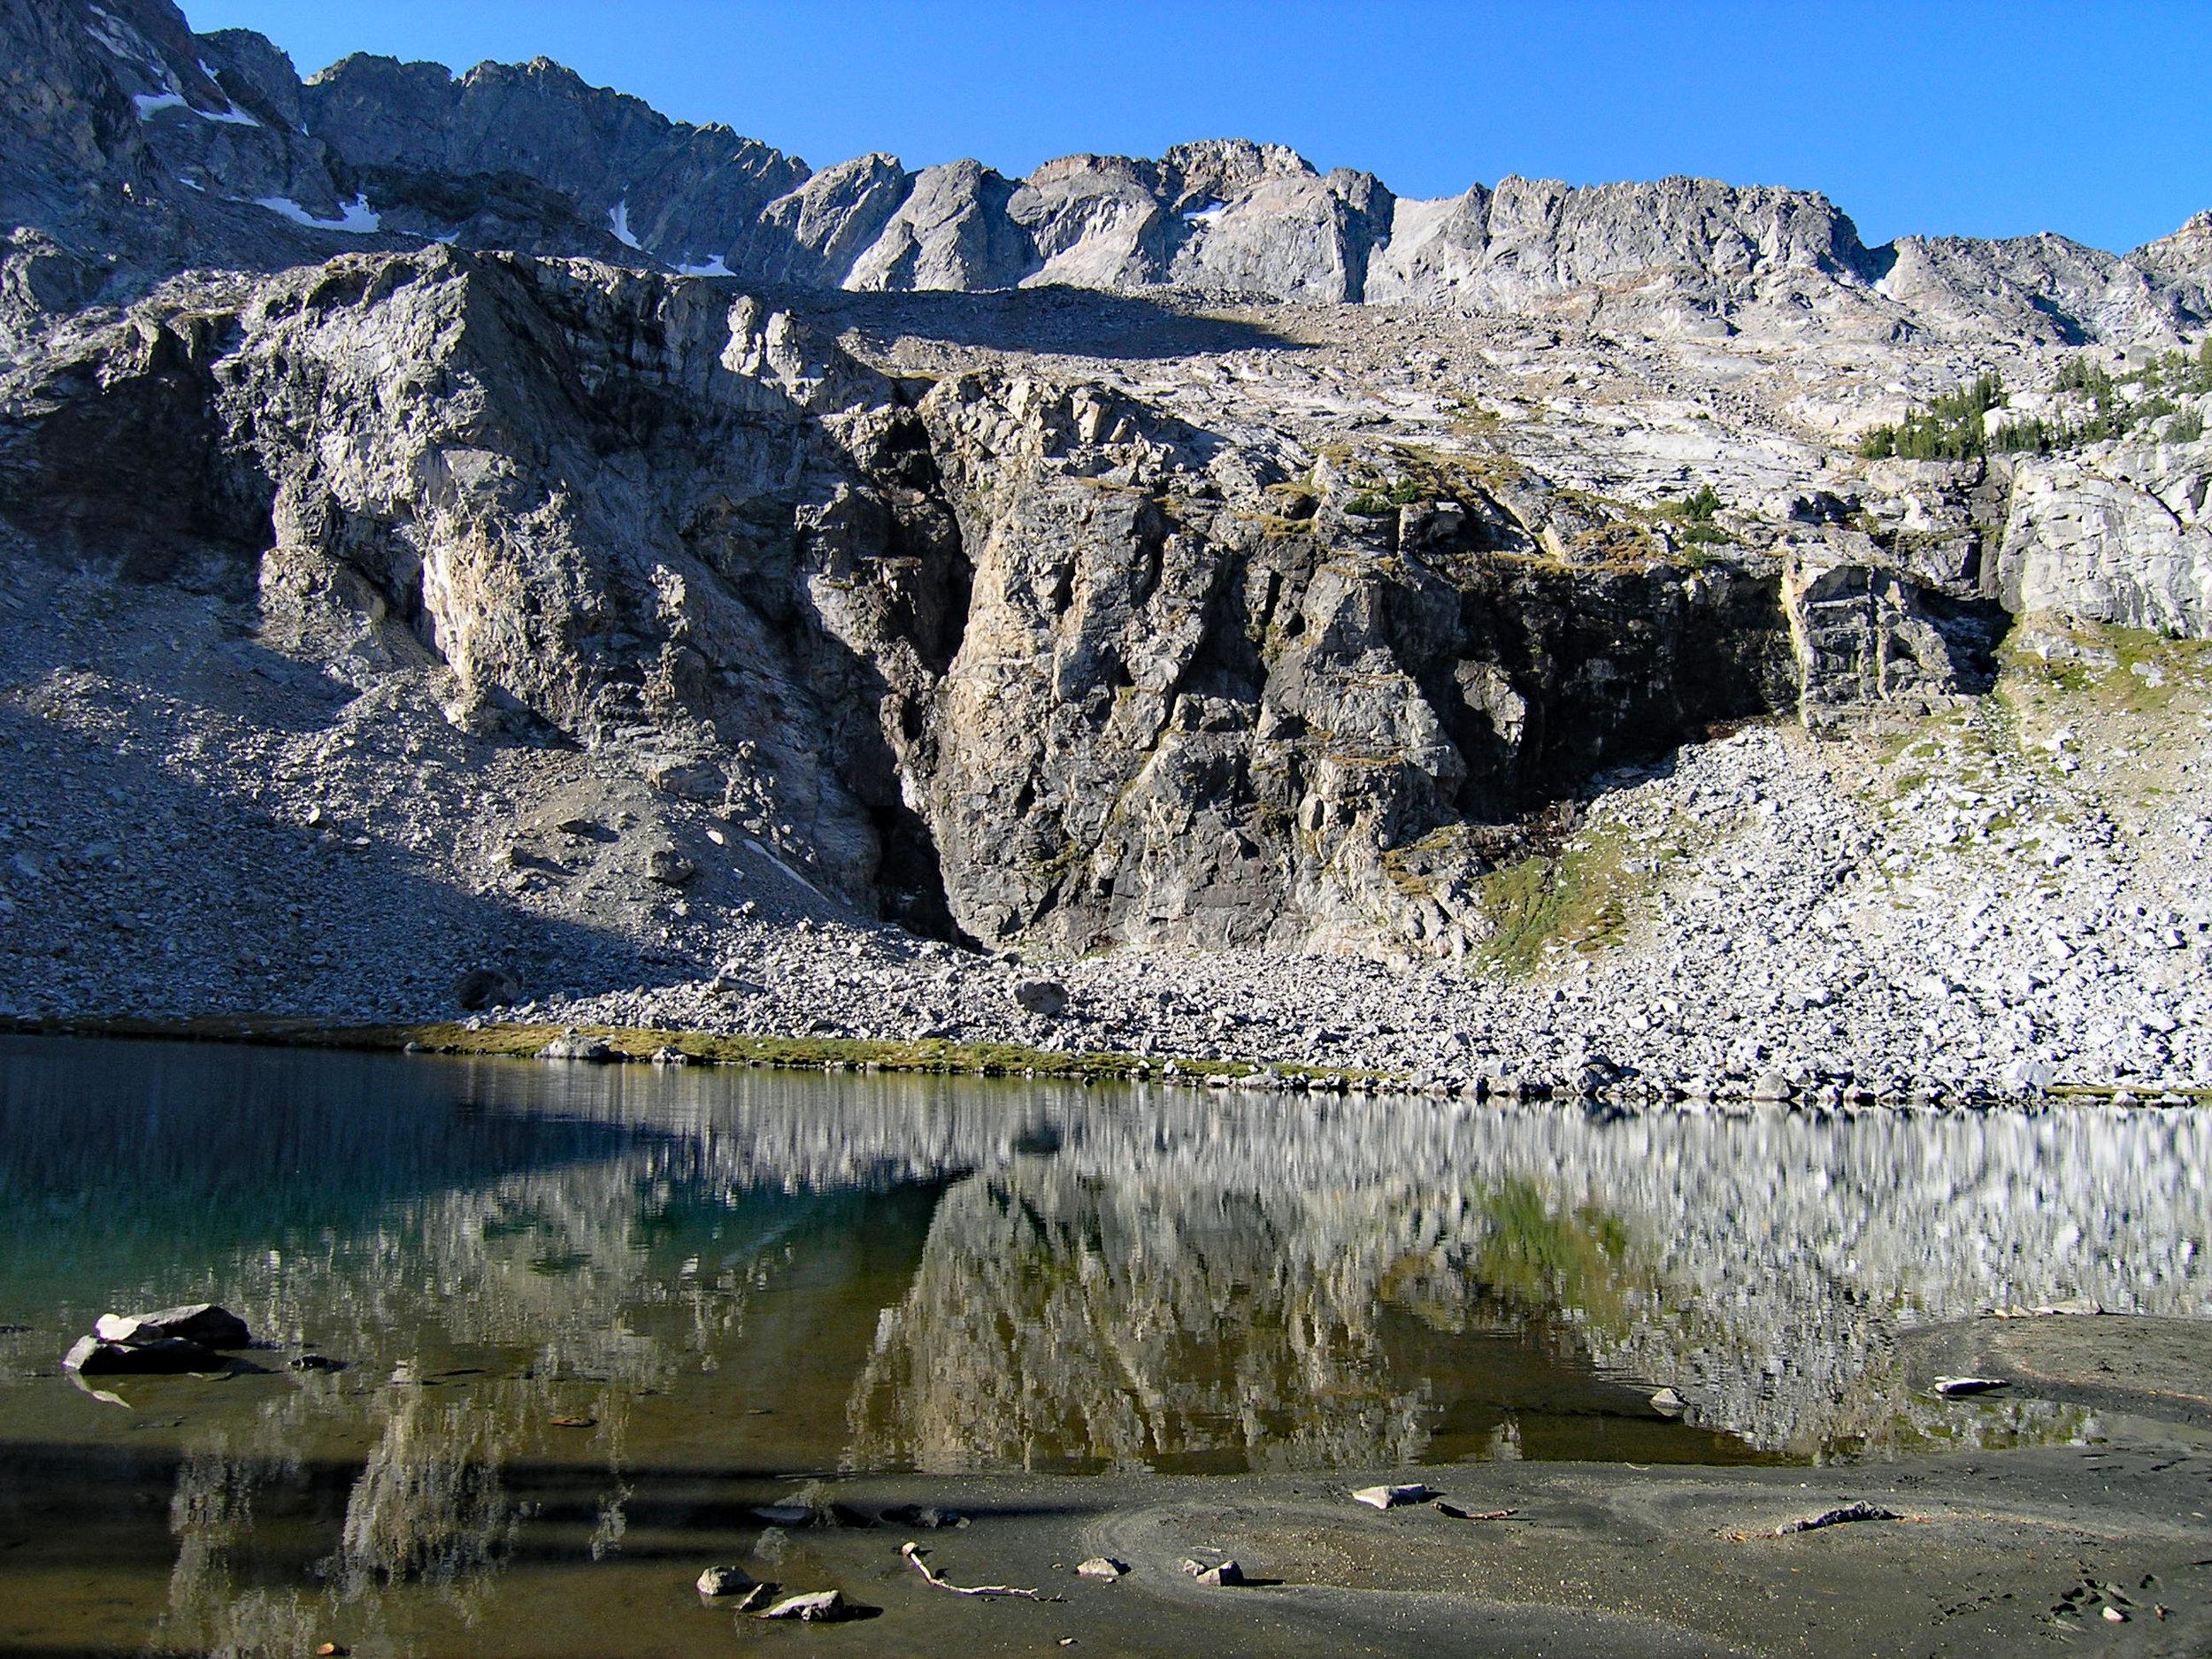 Kane Lake Sept 2006 140.a.jpg